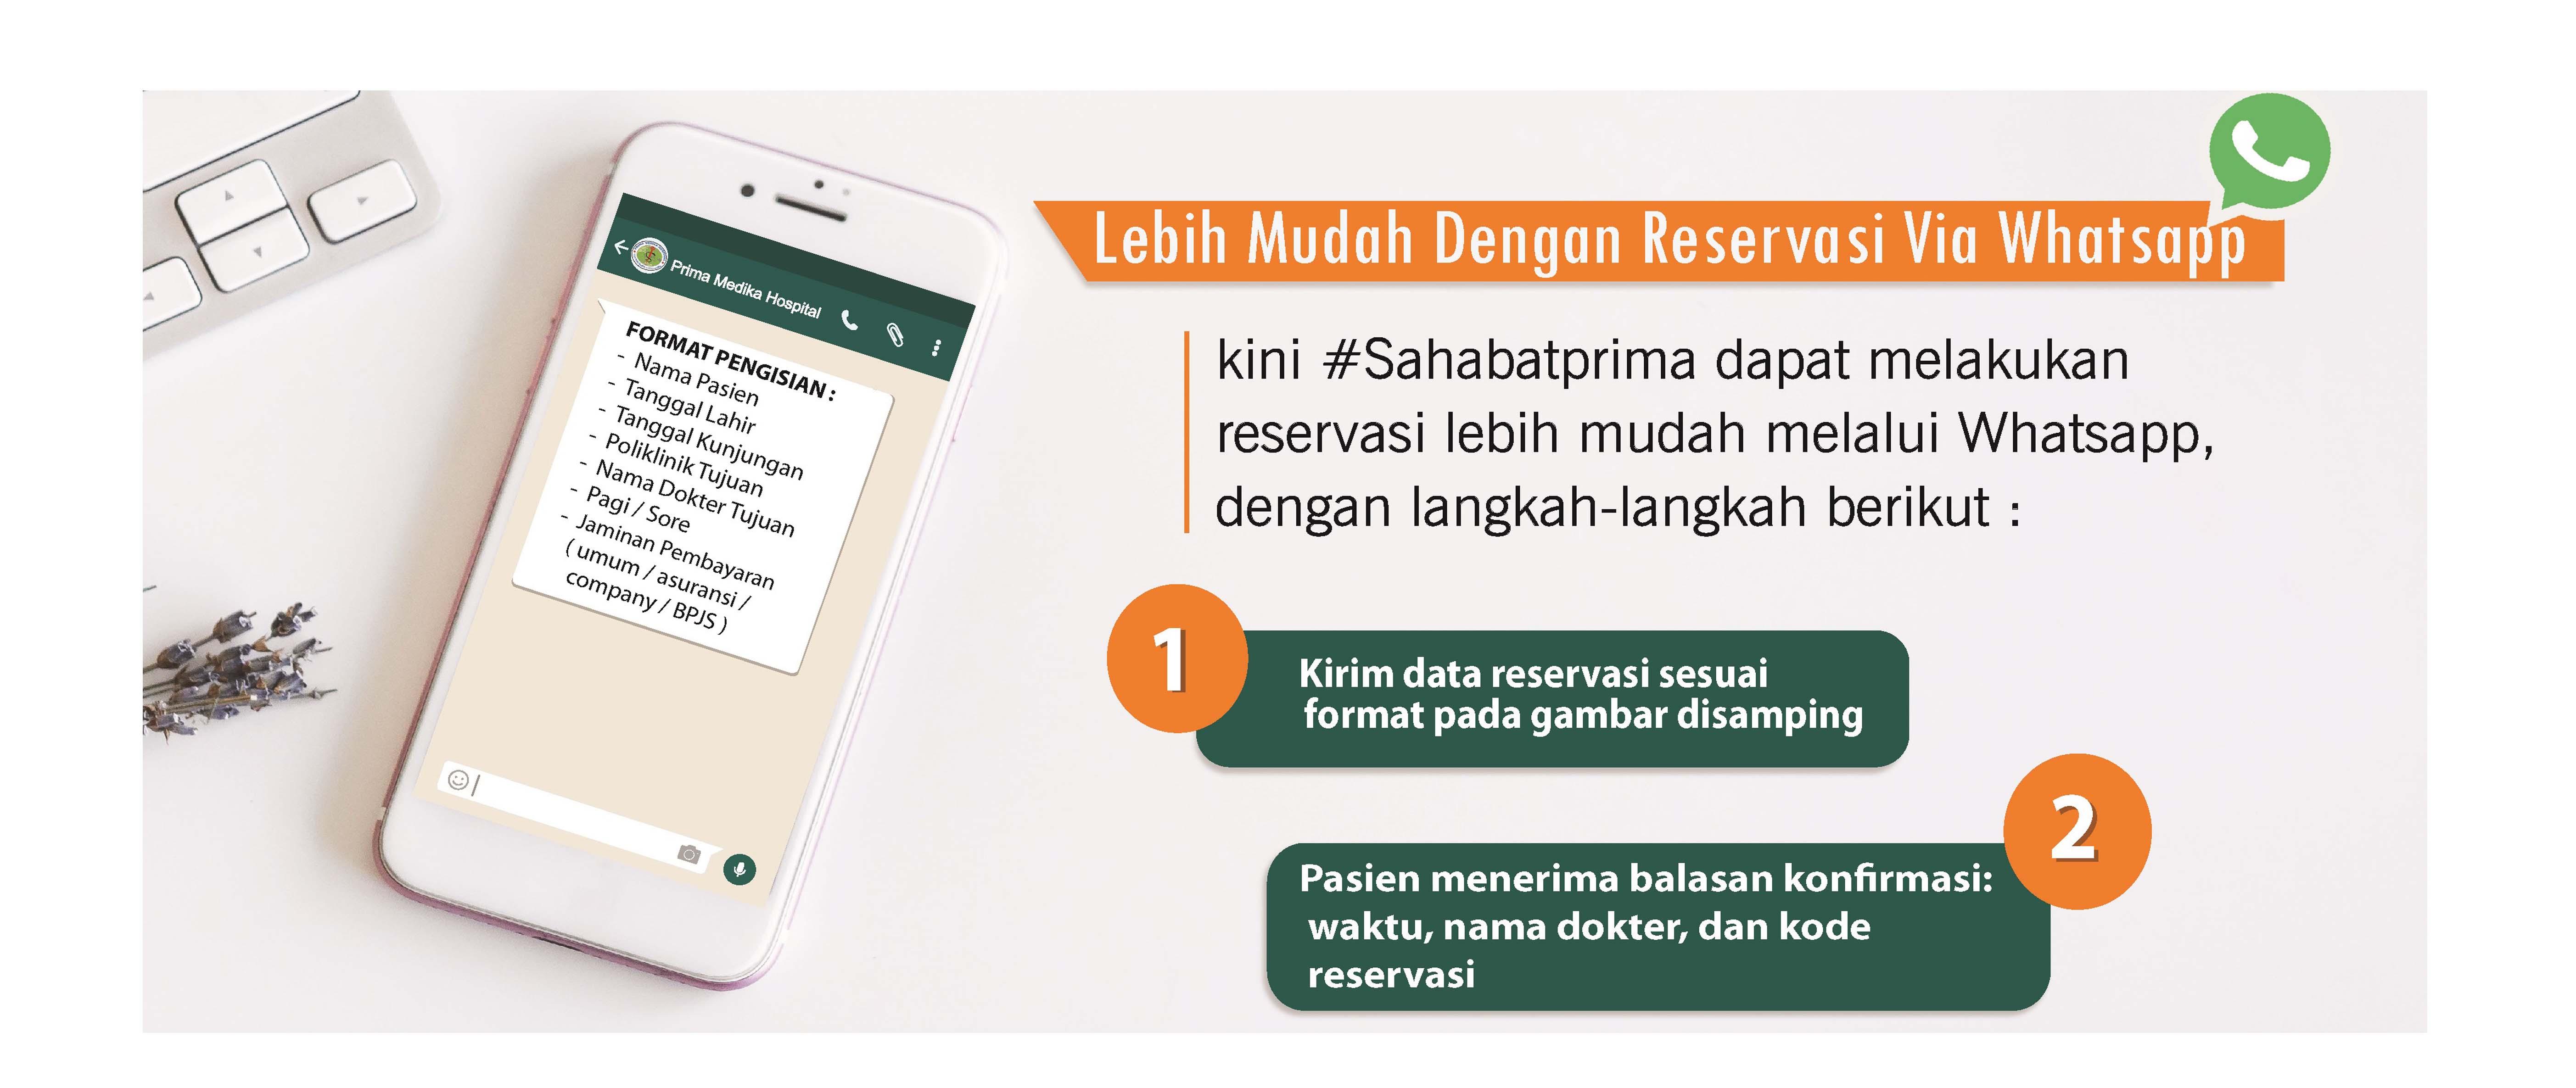 kini Anda dapat melakukan reservasi dengan lebih mudah via Whatsapp, Caranya ?